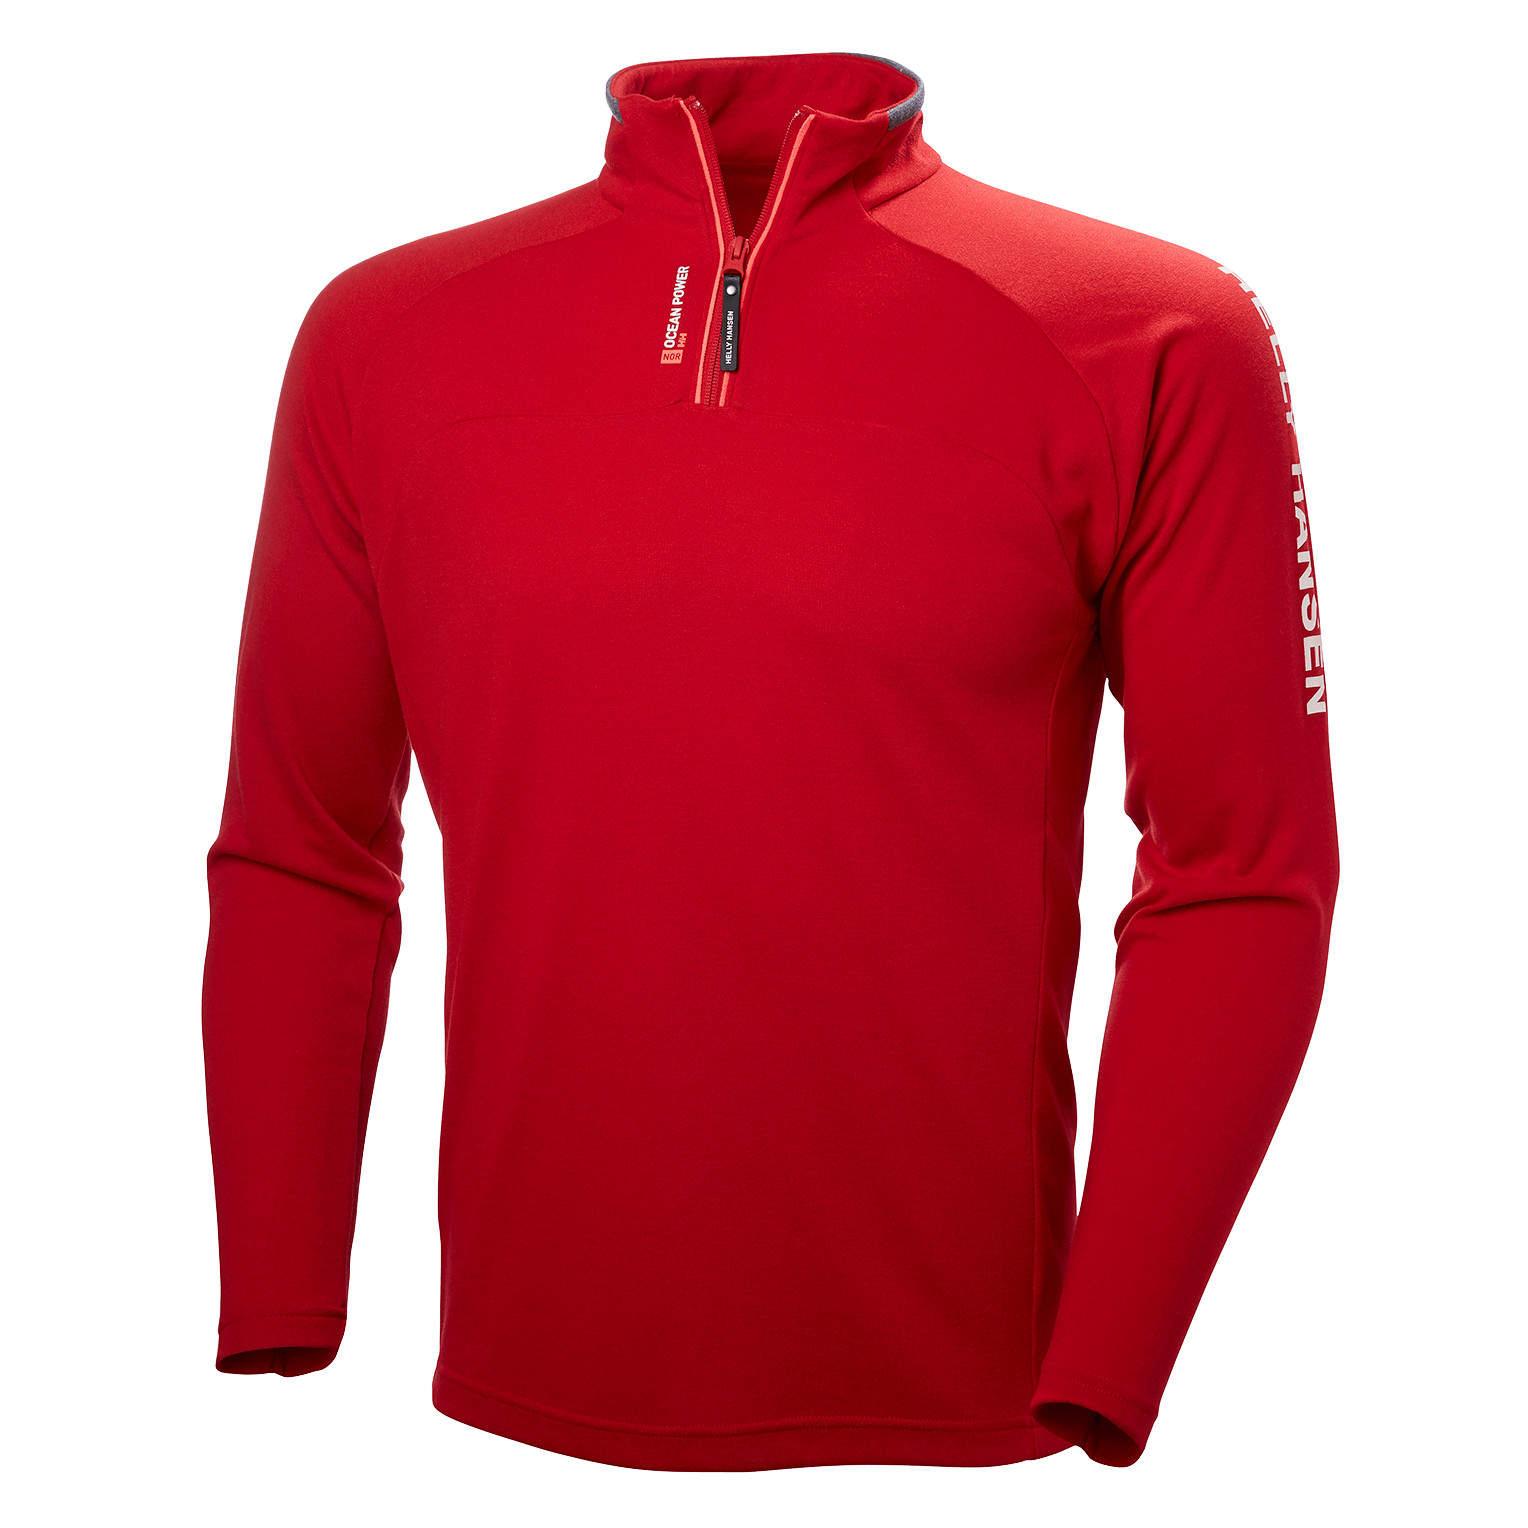 men 39 s helly hansen hp 1 2 zip pullover red. Black Bedroom Furniture Sets. Home Design Ideas